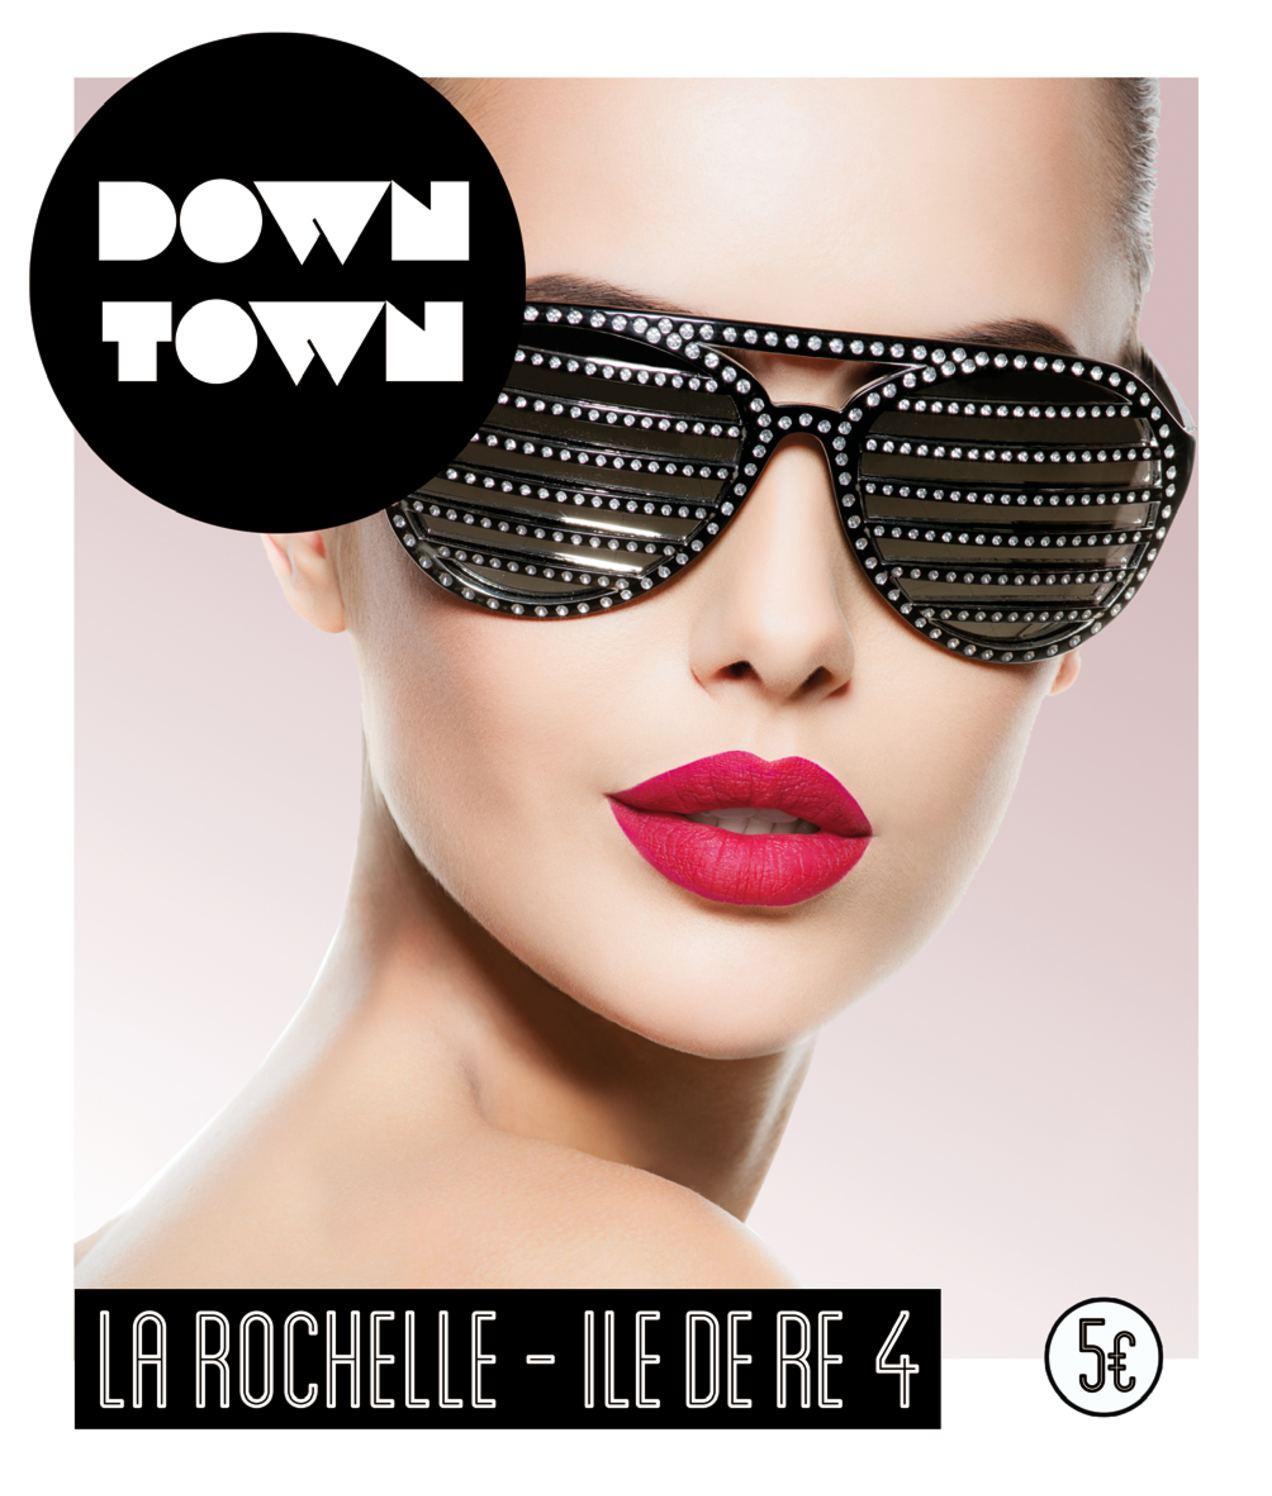 Calaméo - Downtown La Rochelle 4 611467ca184a